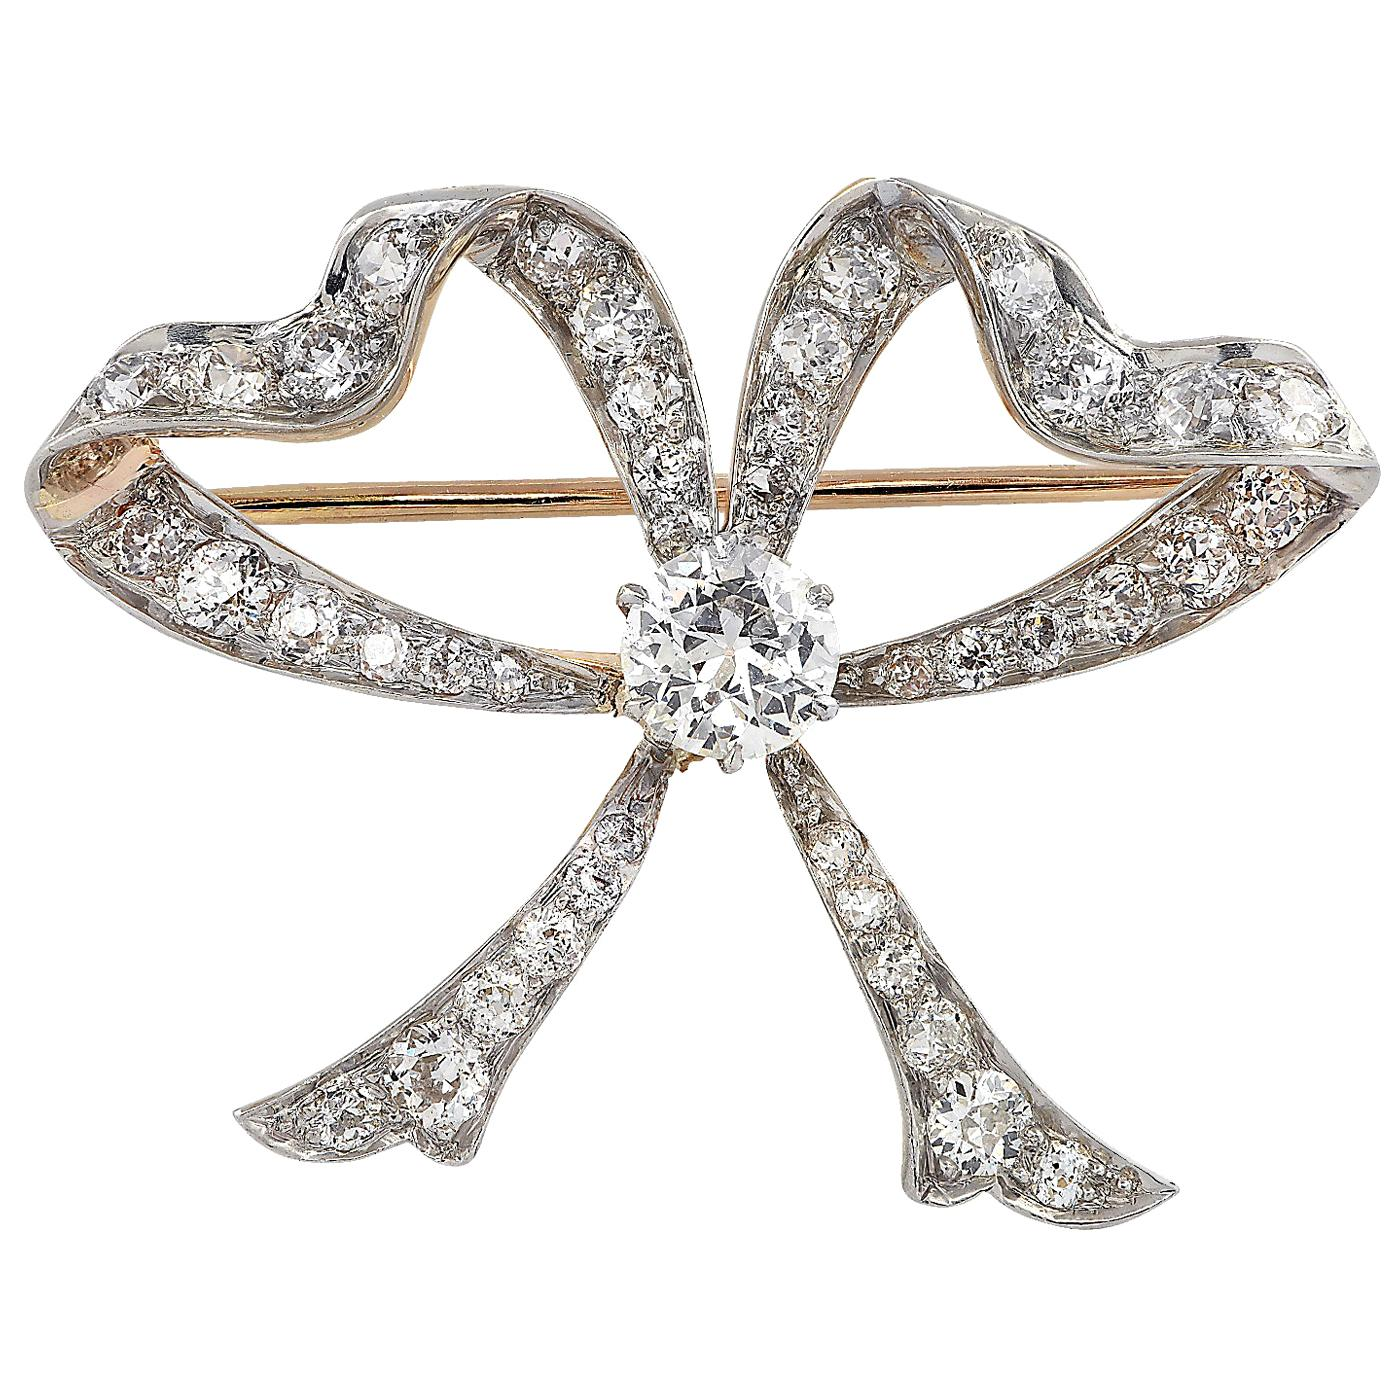 Victorian 3.1 Carat Diamond Bow Brooch Pin